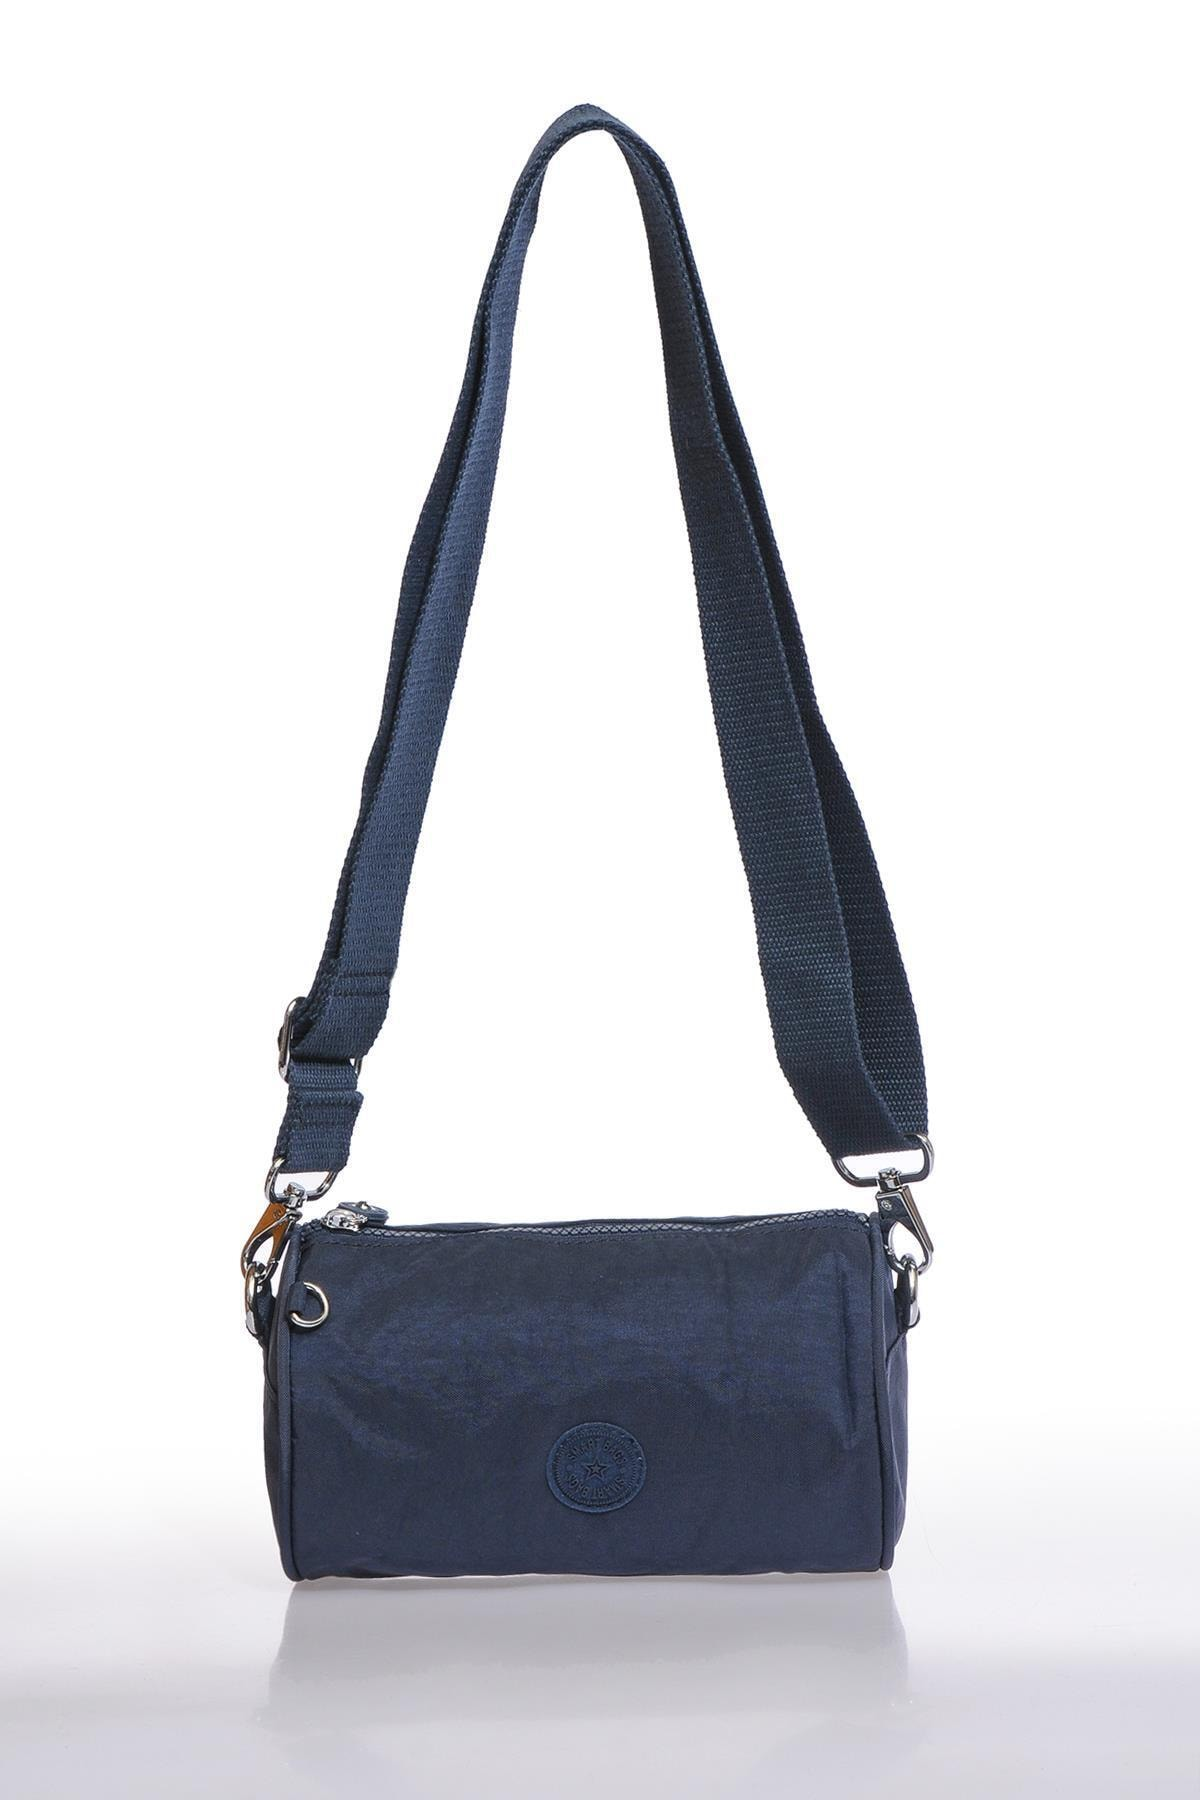 SMART BAGS Smb3025-0033 Lacivert Kadın Çapraz Çanta 1